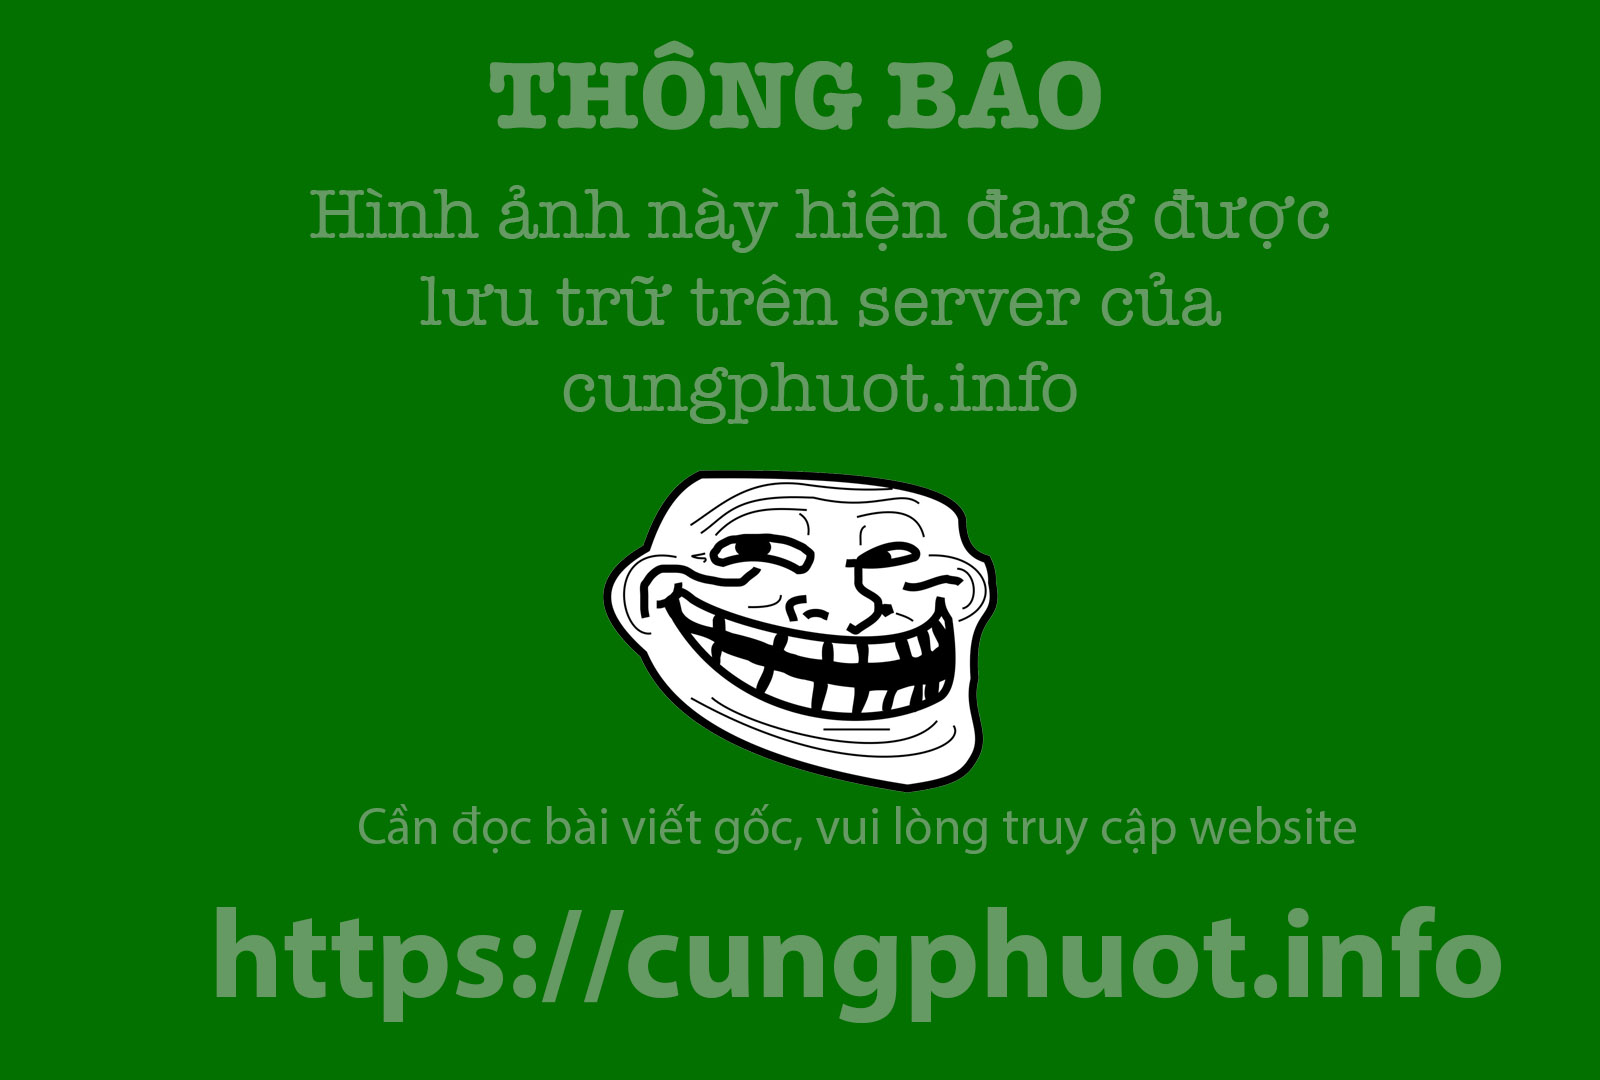 Ve dep thanh cao, huyen bi cua Dan vien Chau Son hinh anh 4